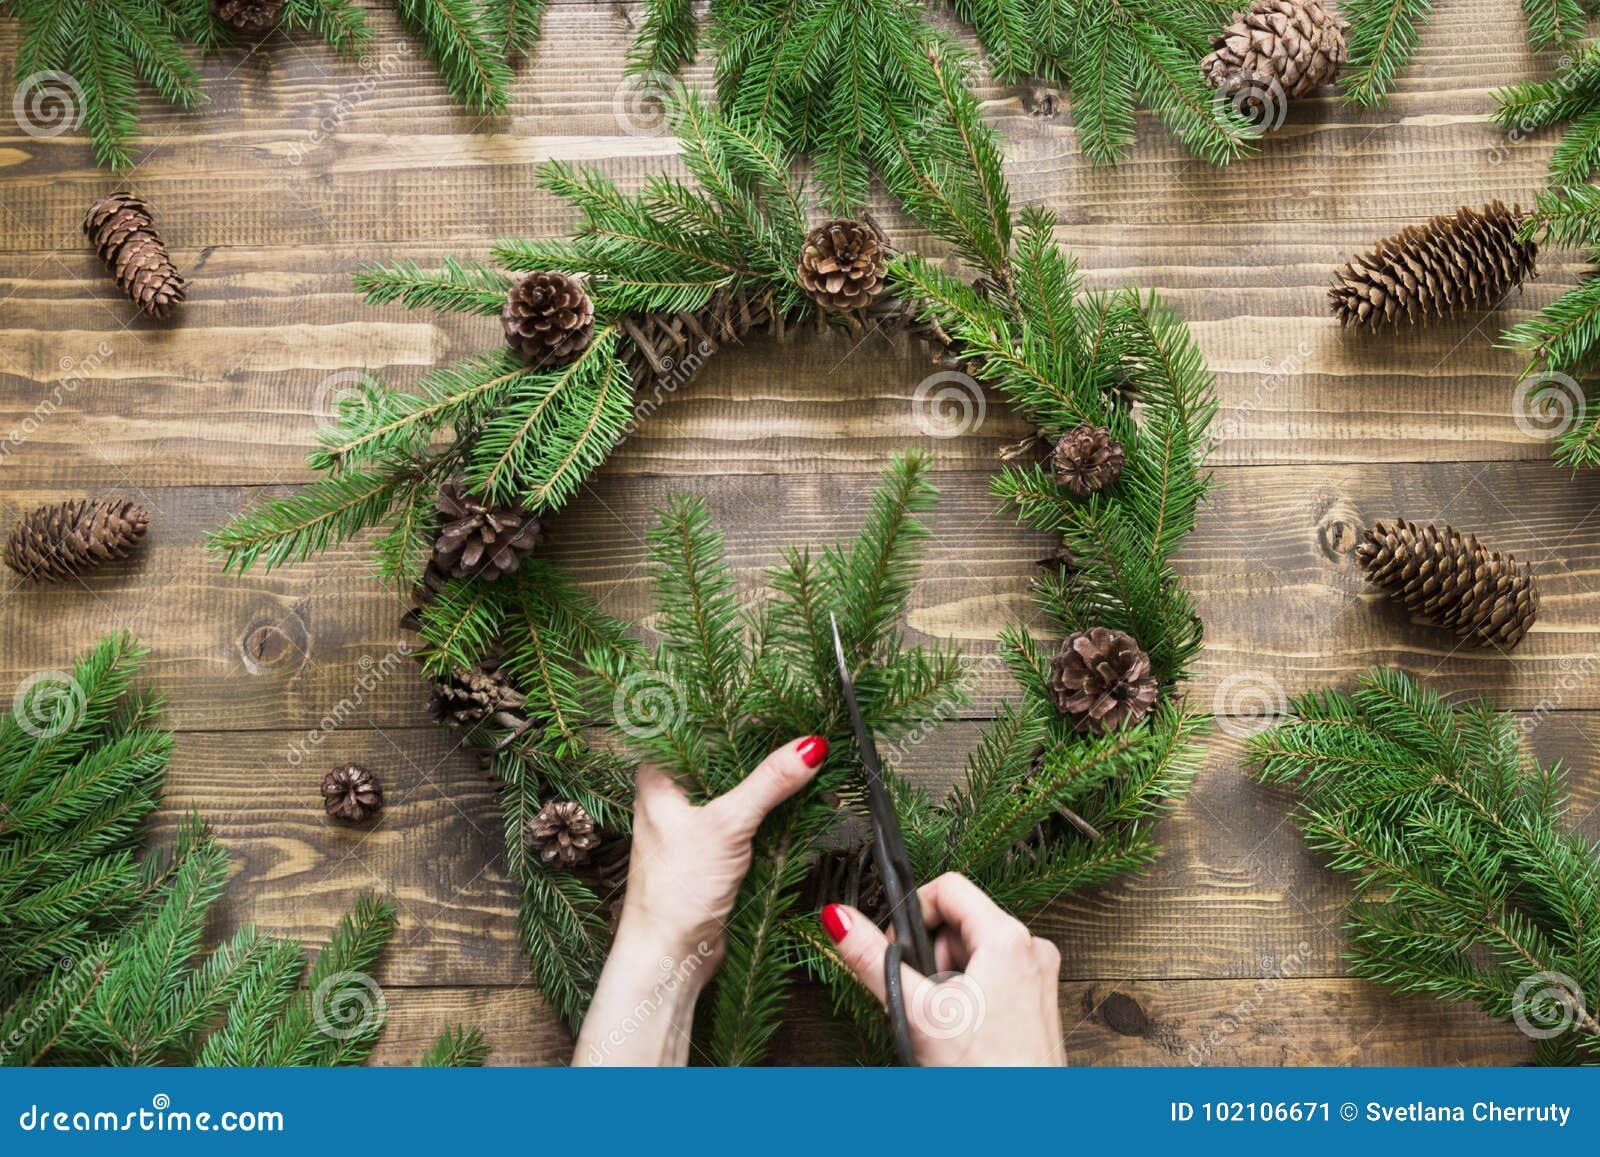 Making Christmas wreath using fresh and all natural materials.